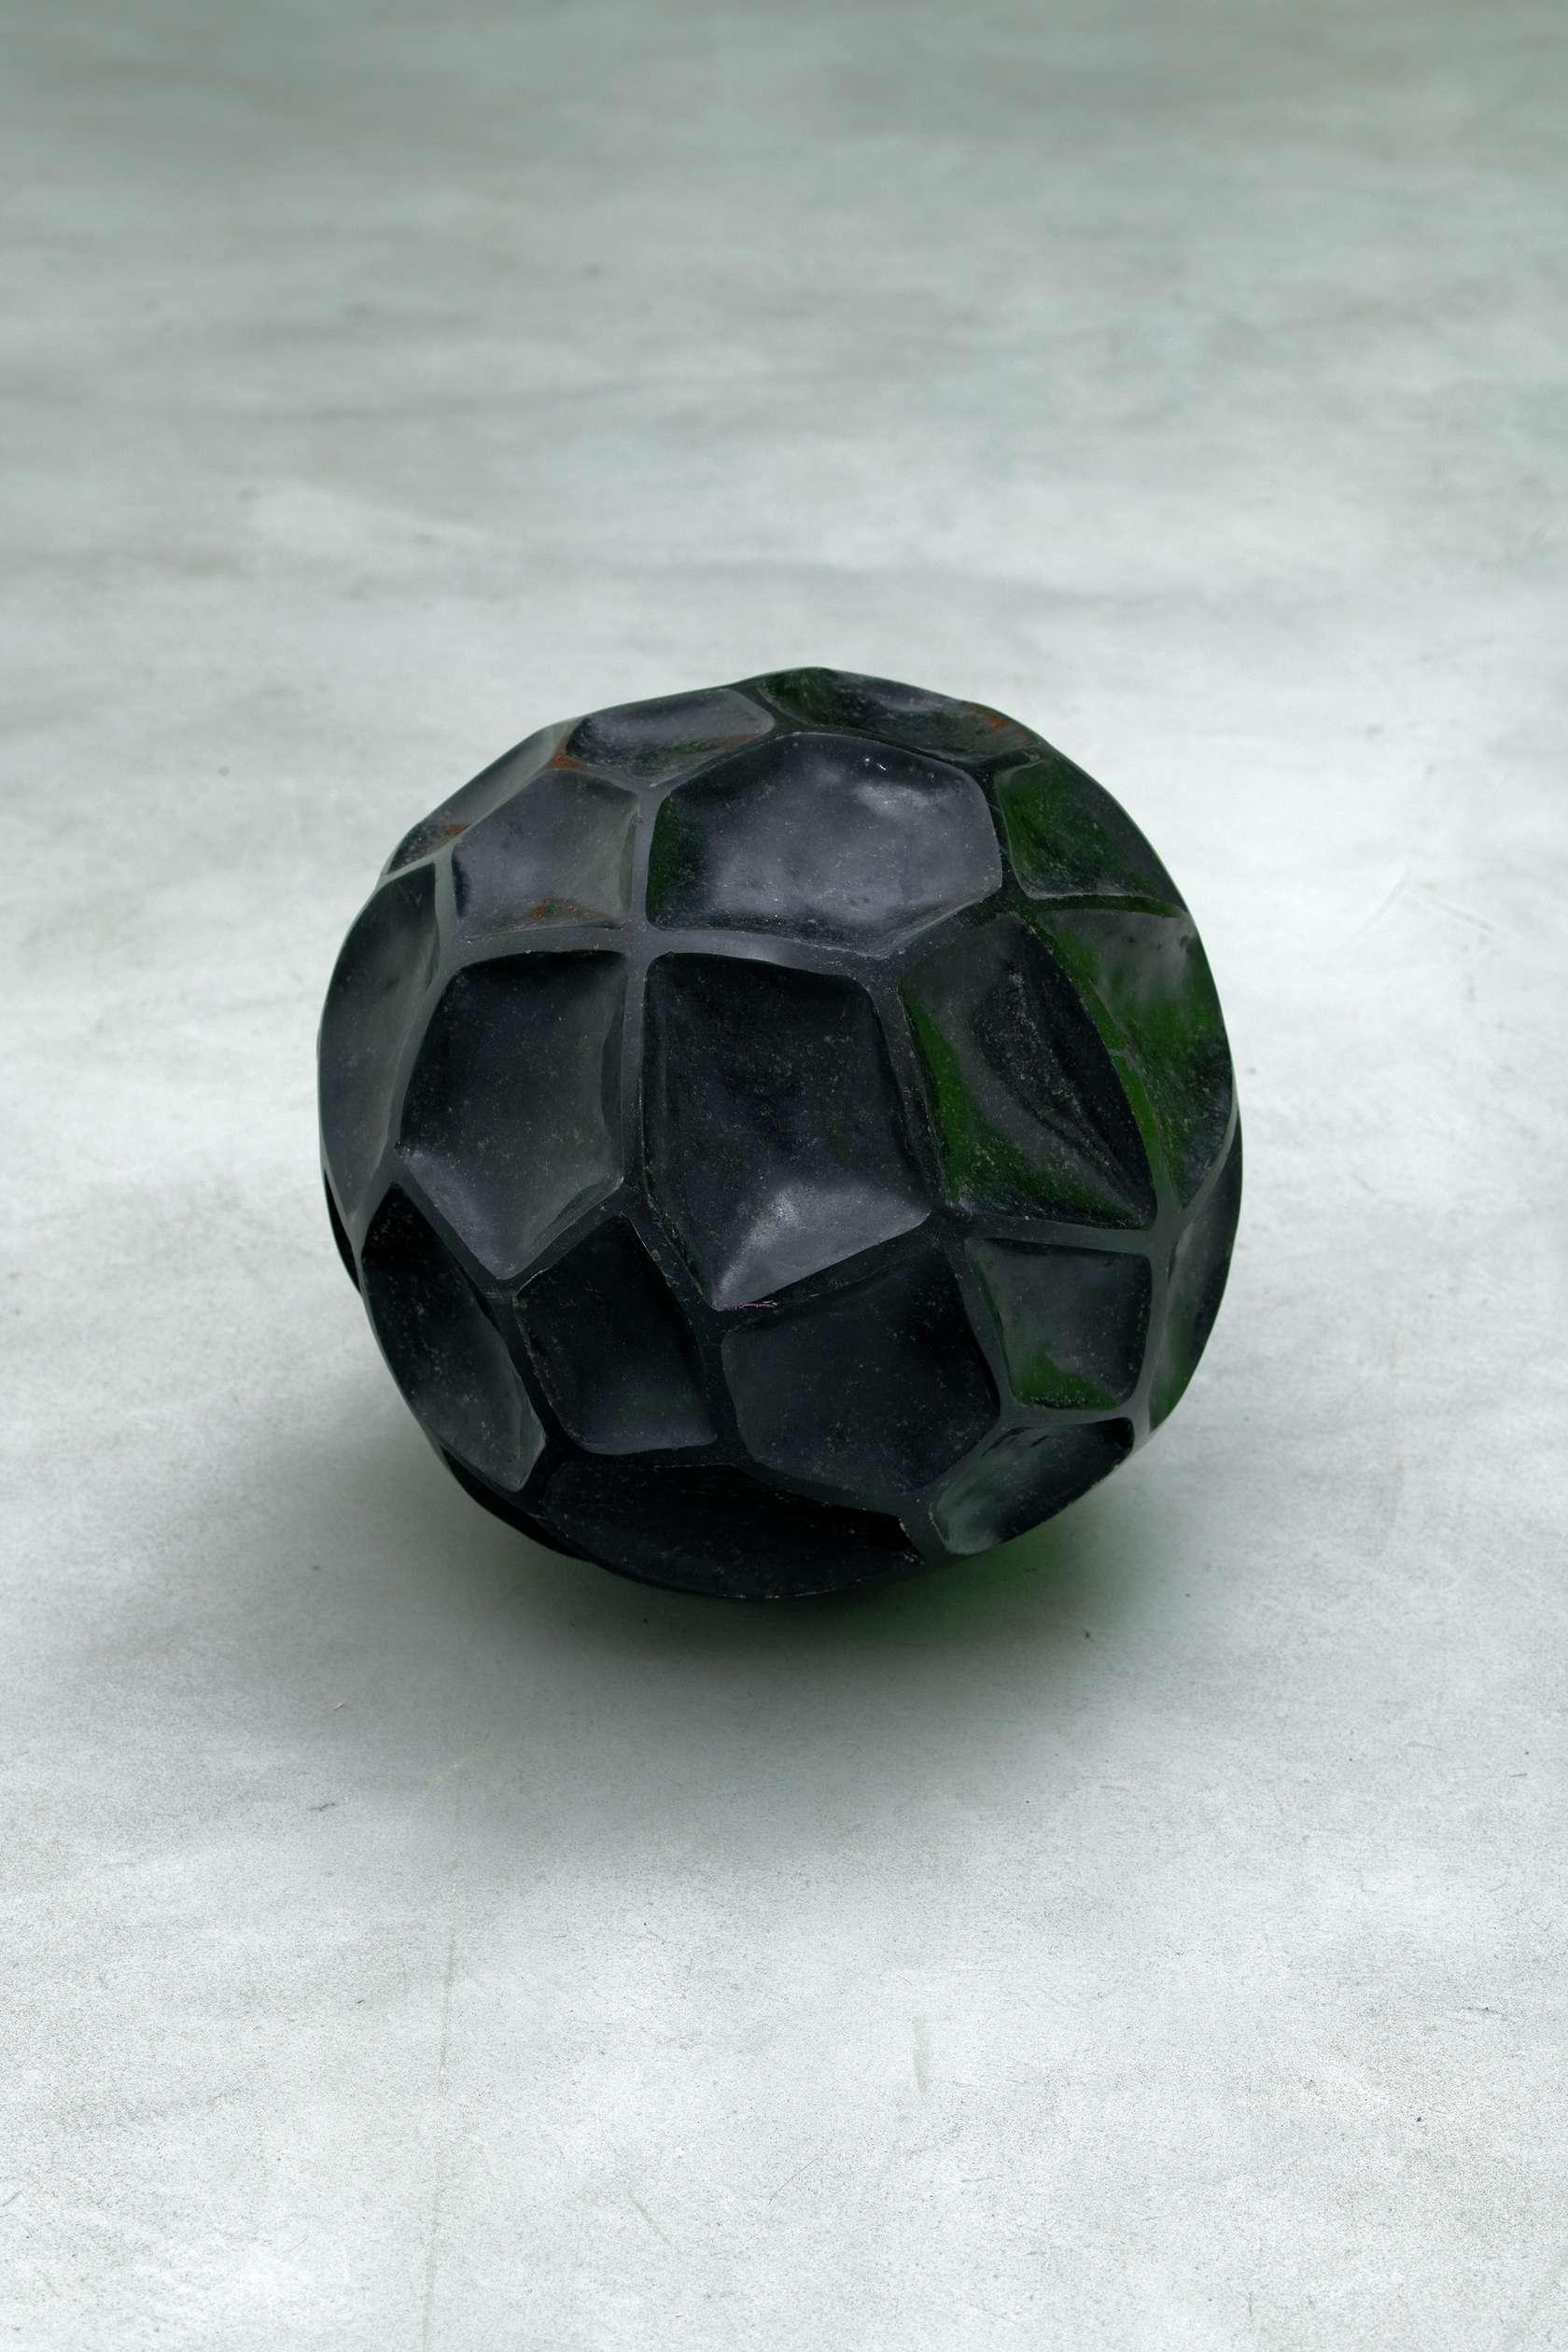 Beat Zoderer, Penta stone, 2016 Granit indien41 cm / 16 1/8 in.